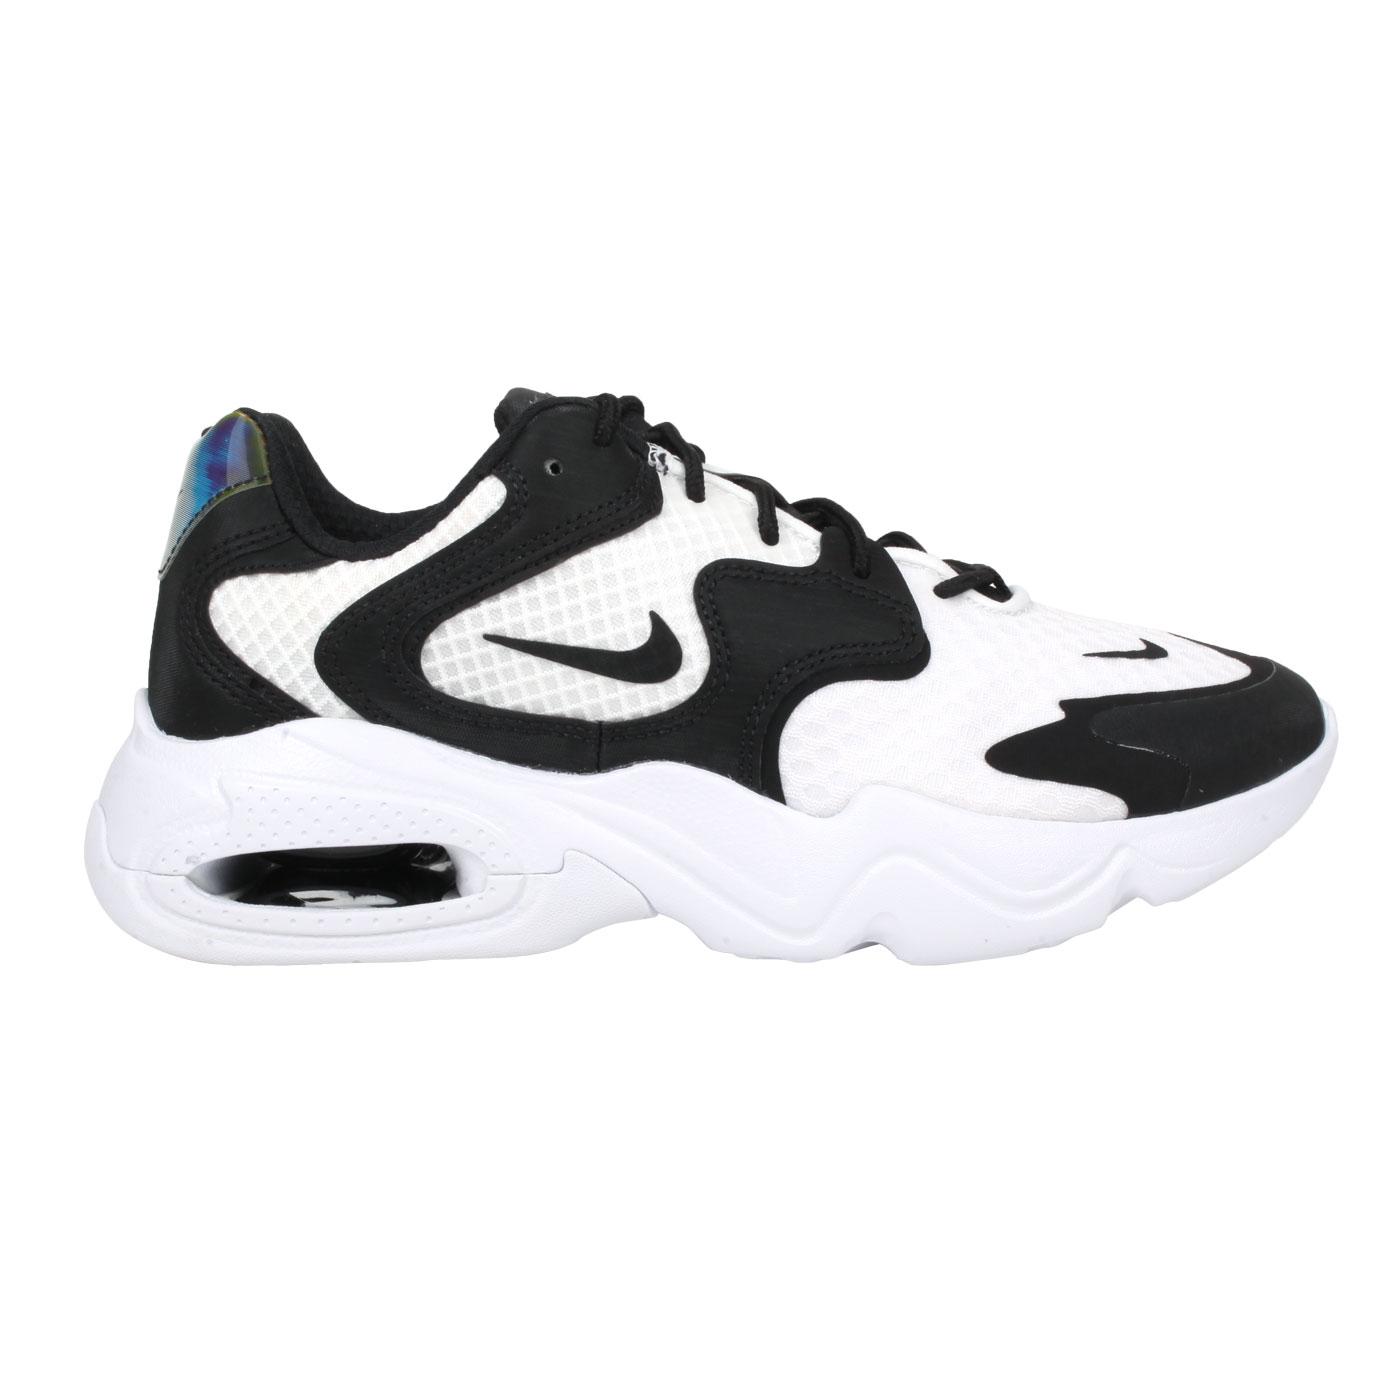 NIKE 女款休閒運動鞋  @WMNS AIR MAX 2X@CK2947100 - 白黑